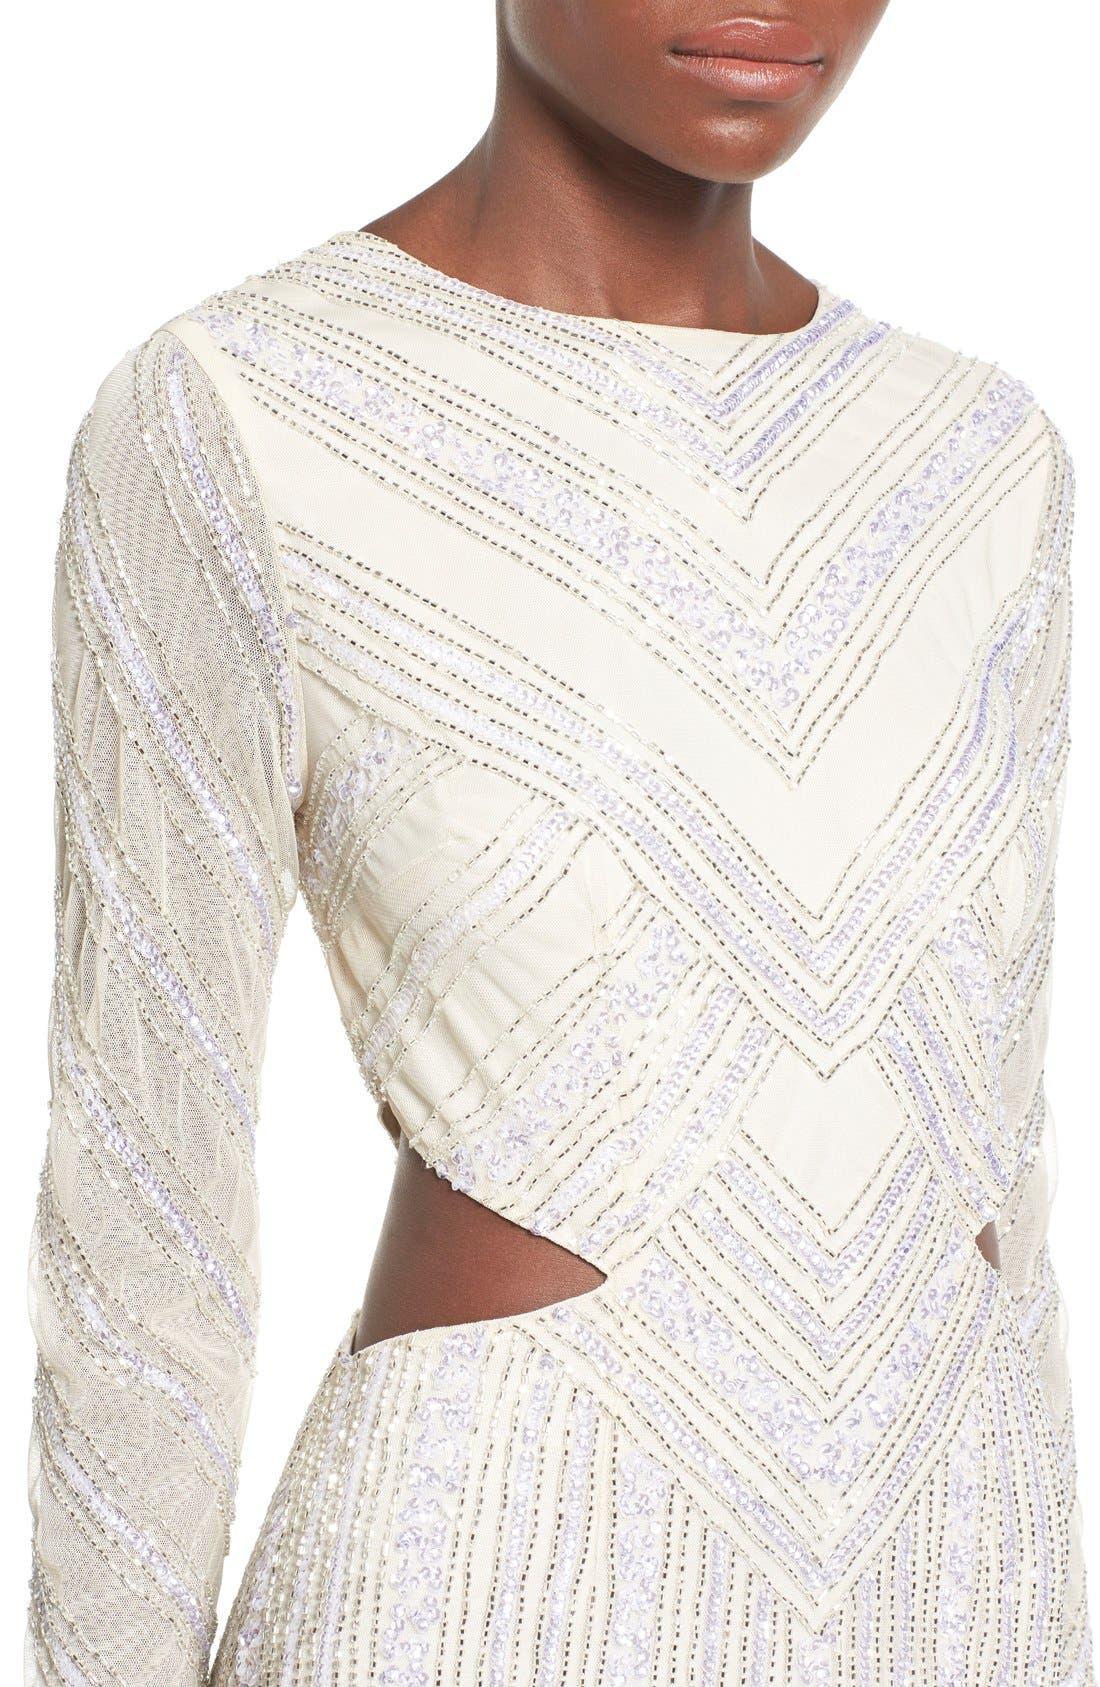 Embellished Cutout Sheath Dress,                             Alternate thumbnail 4, color,                             White